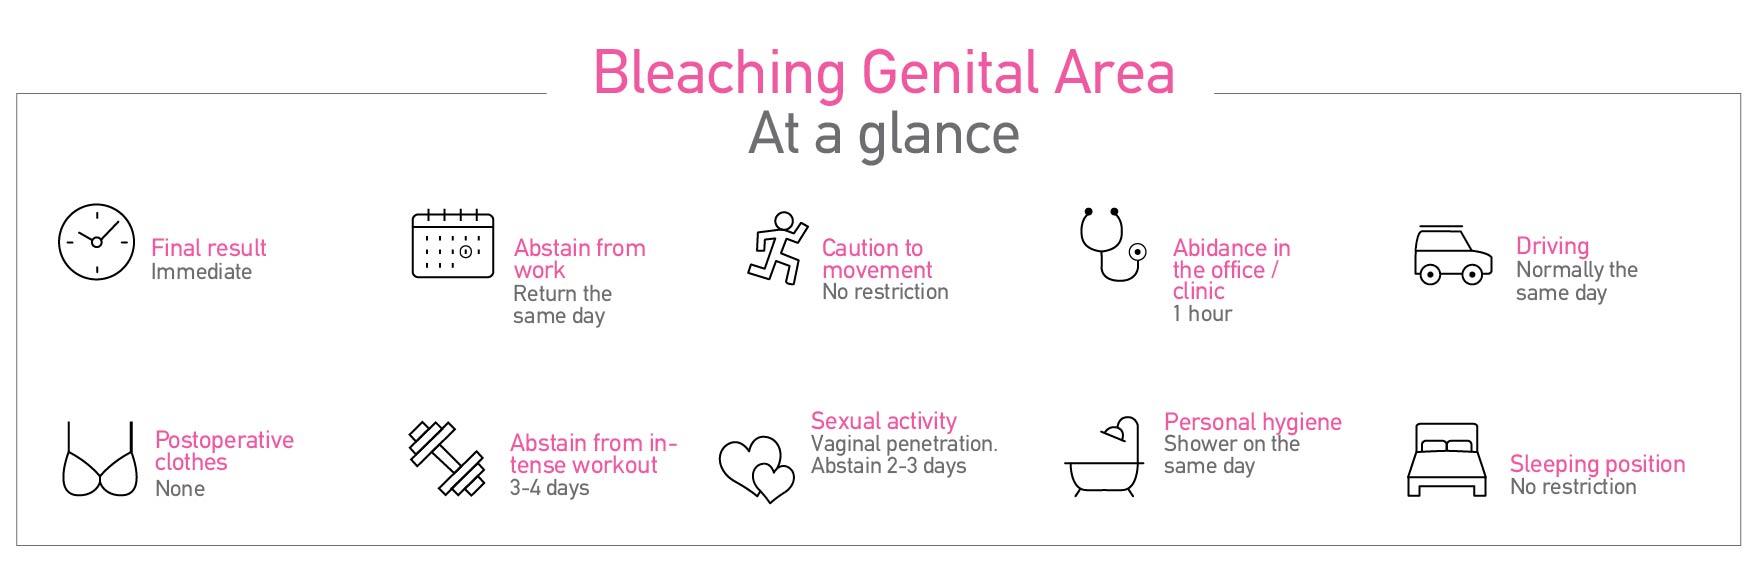 Bleaching Genital Area